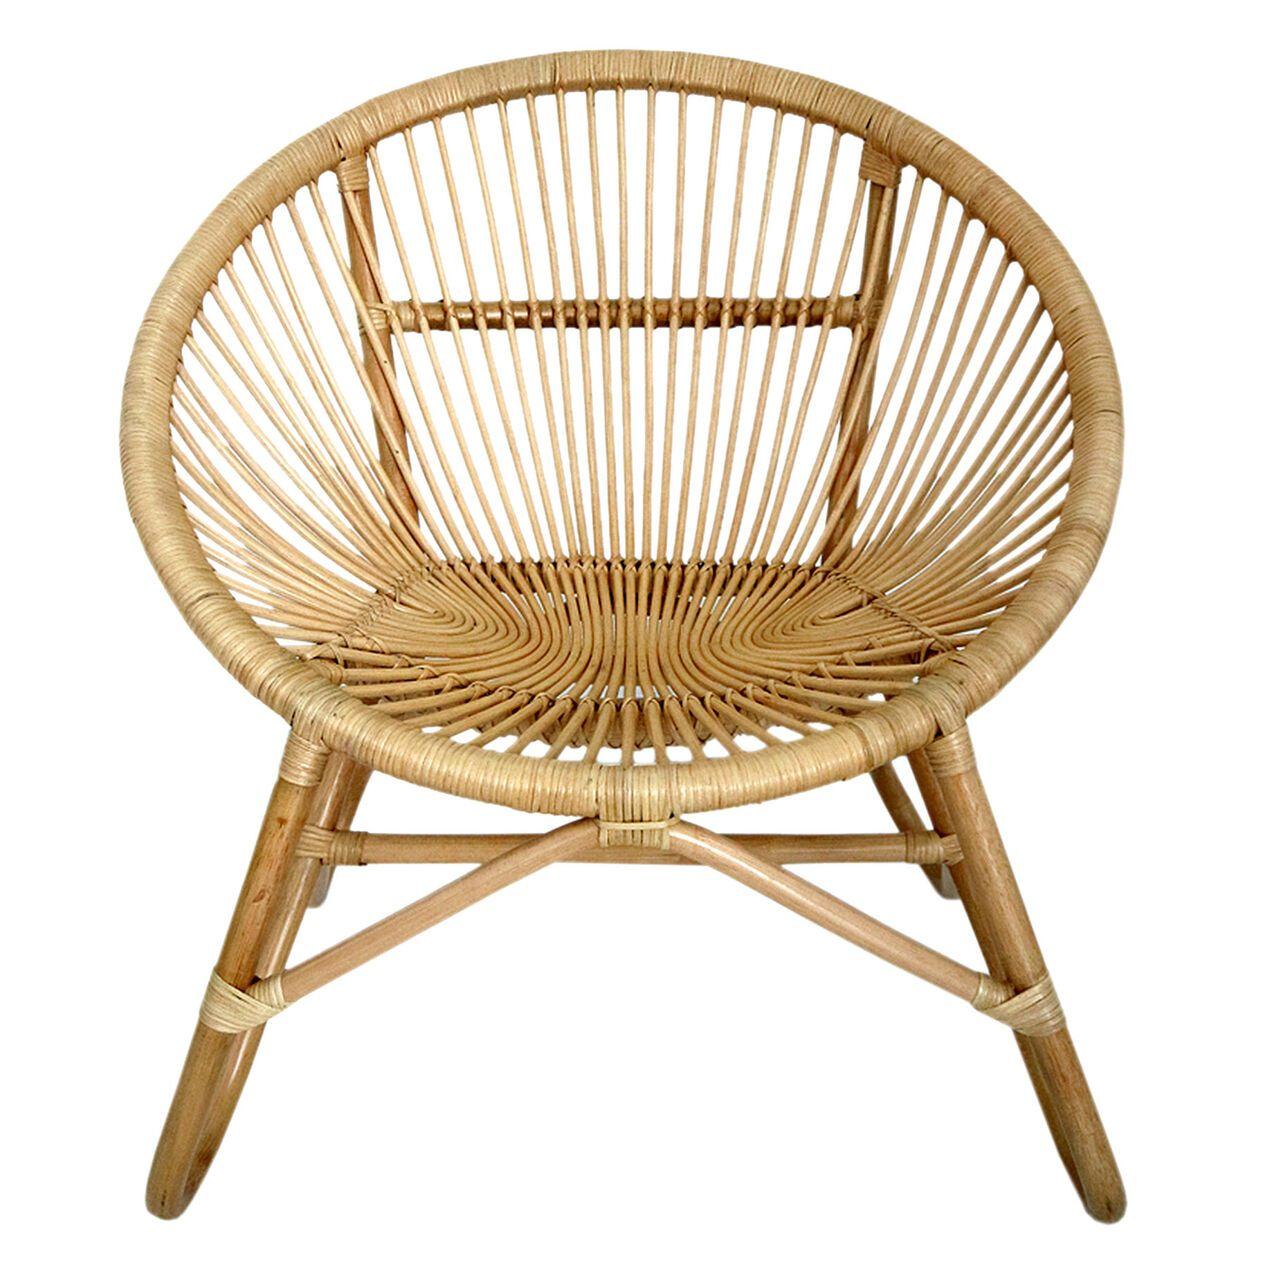 Round Rattan Chair W Metal Legs K D 31x27 8x31 8 Occasional Seating Rattan Chair Chair